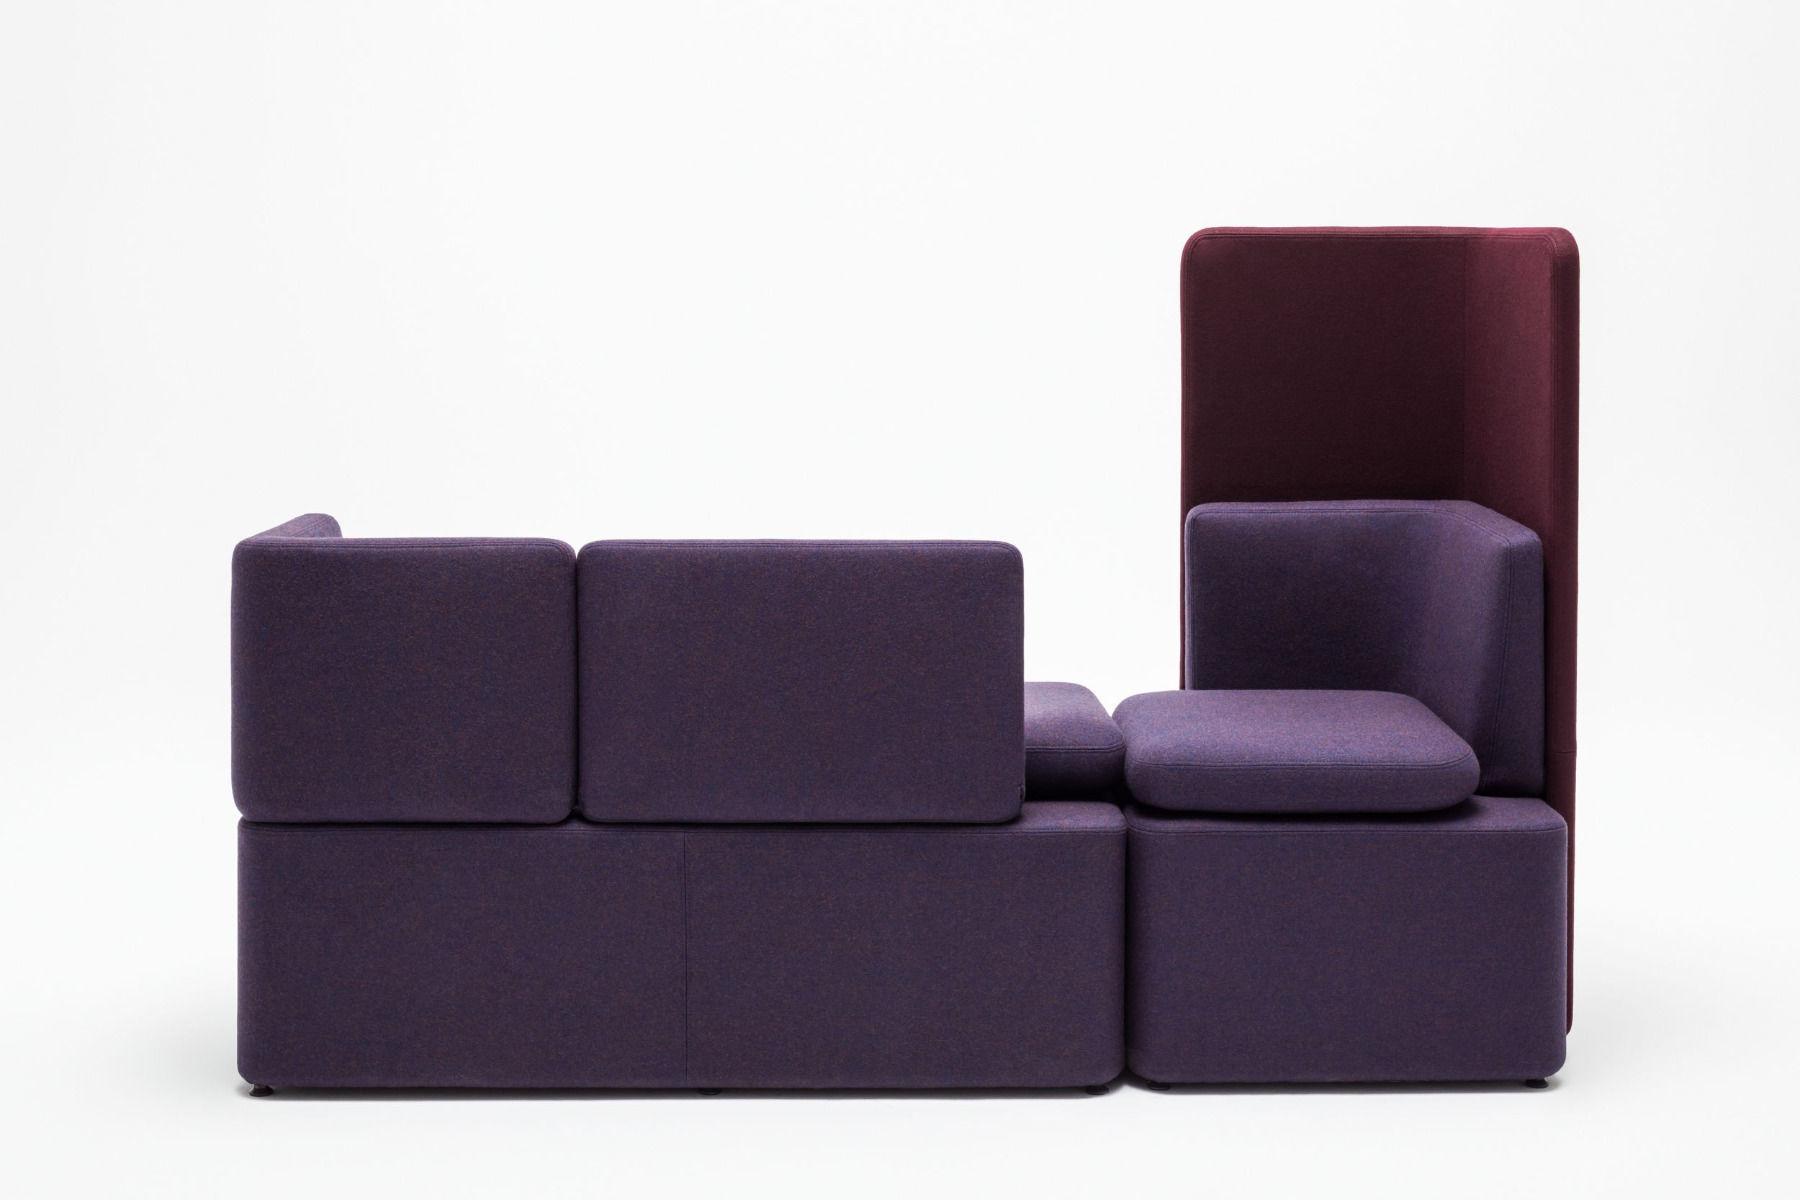 empfangstheken sitzmoebel studiomoebel violett rot kasten back